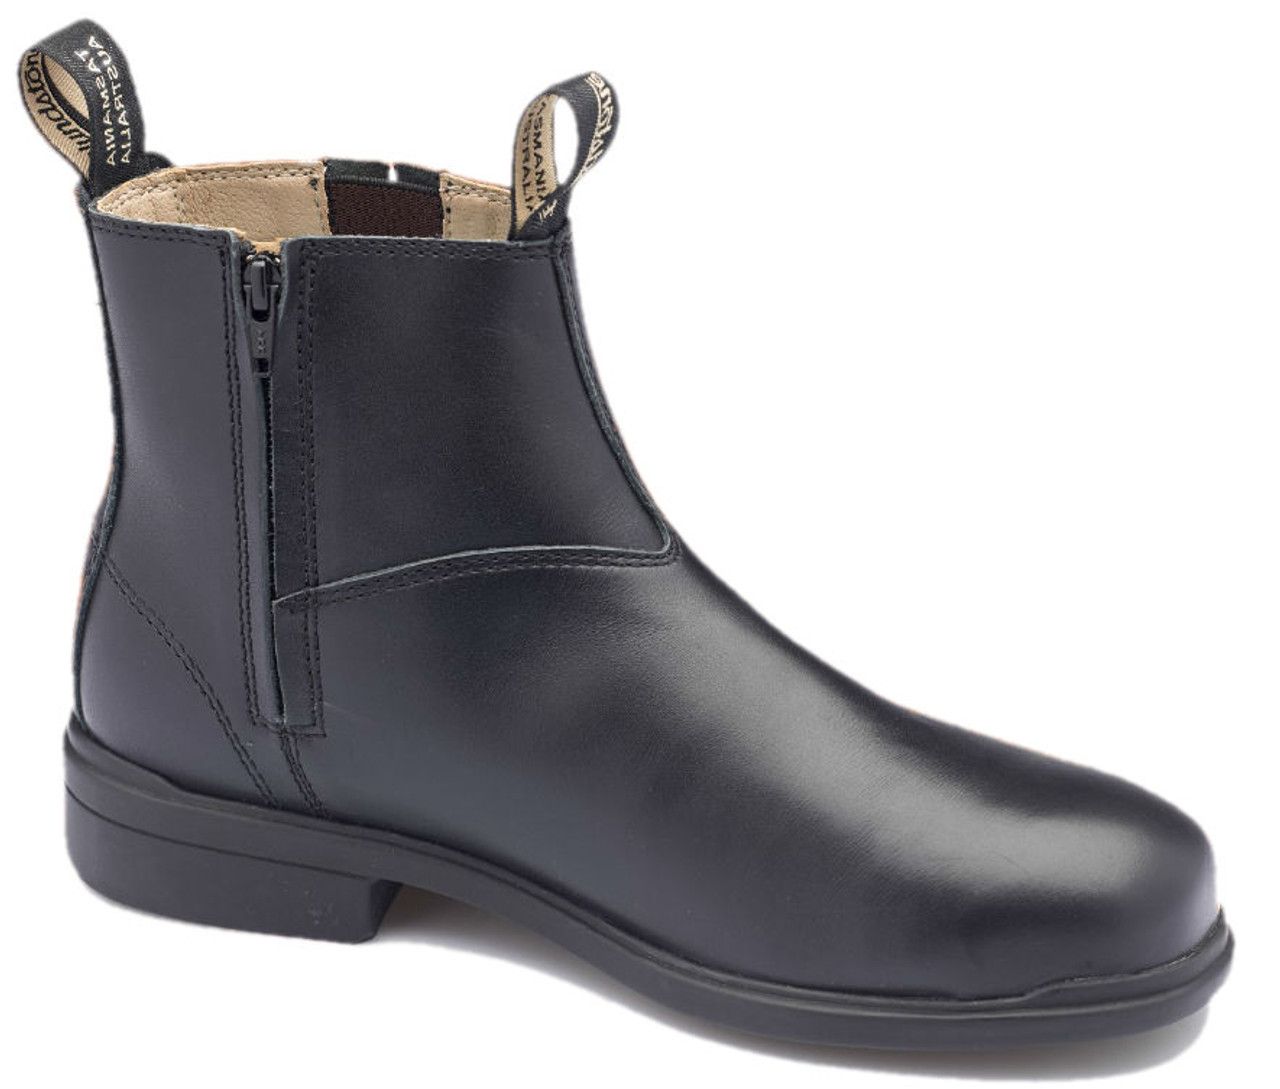 0c719964038 Blundstone 783 Black Full Grain Leather Zip Sided Steel Toe Safety ...